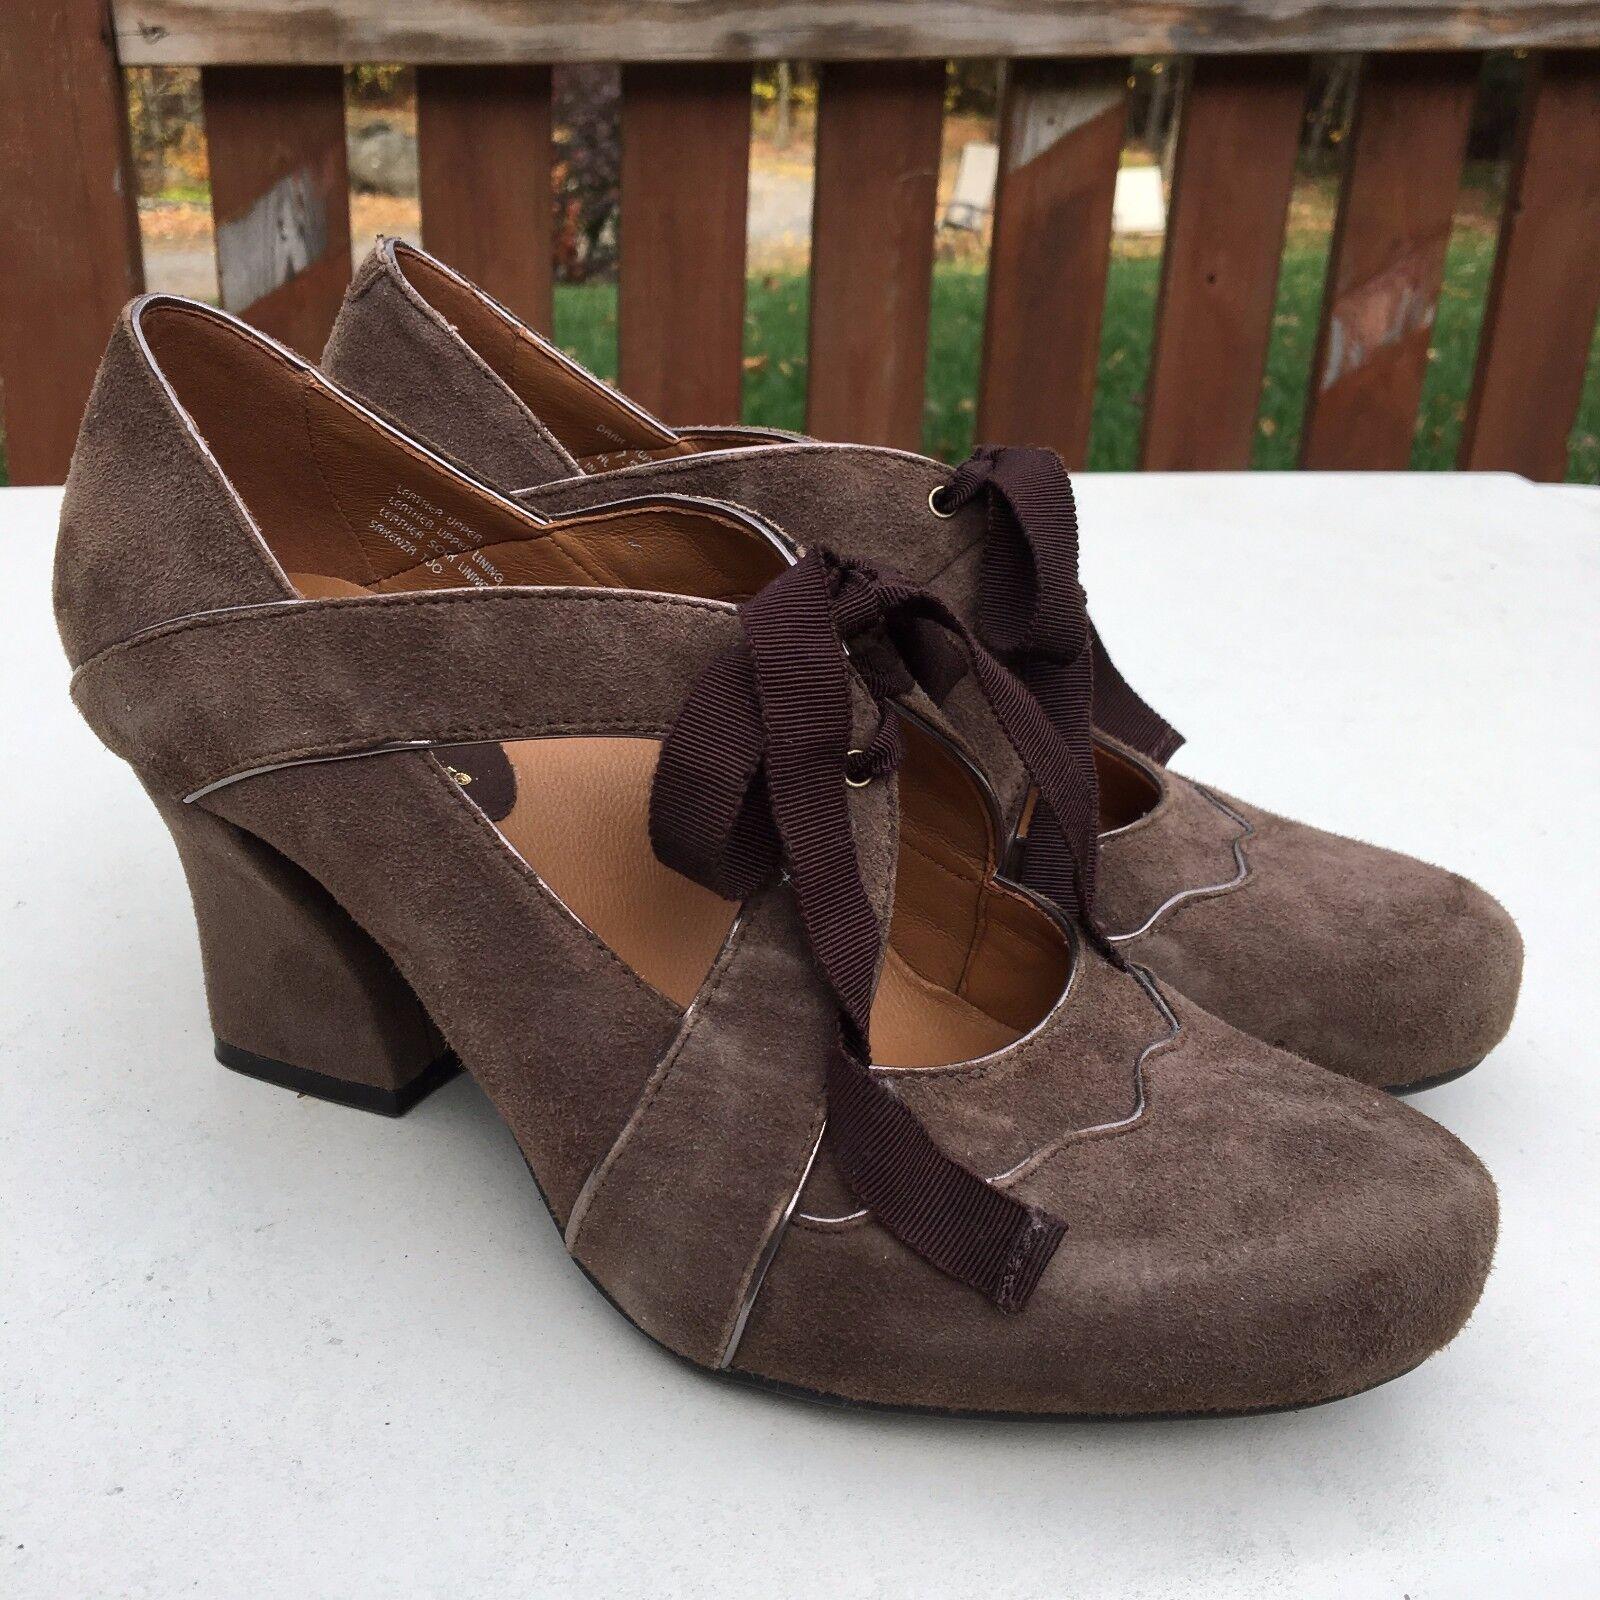 EARTHIES Sarenza Brown Taupe Suede Mary Jane Heels Retro 20s Speakeasy  169 7.5